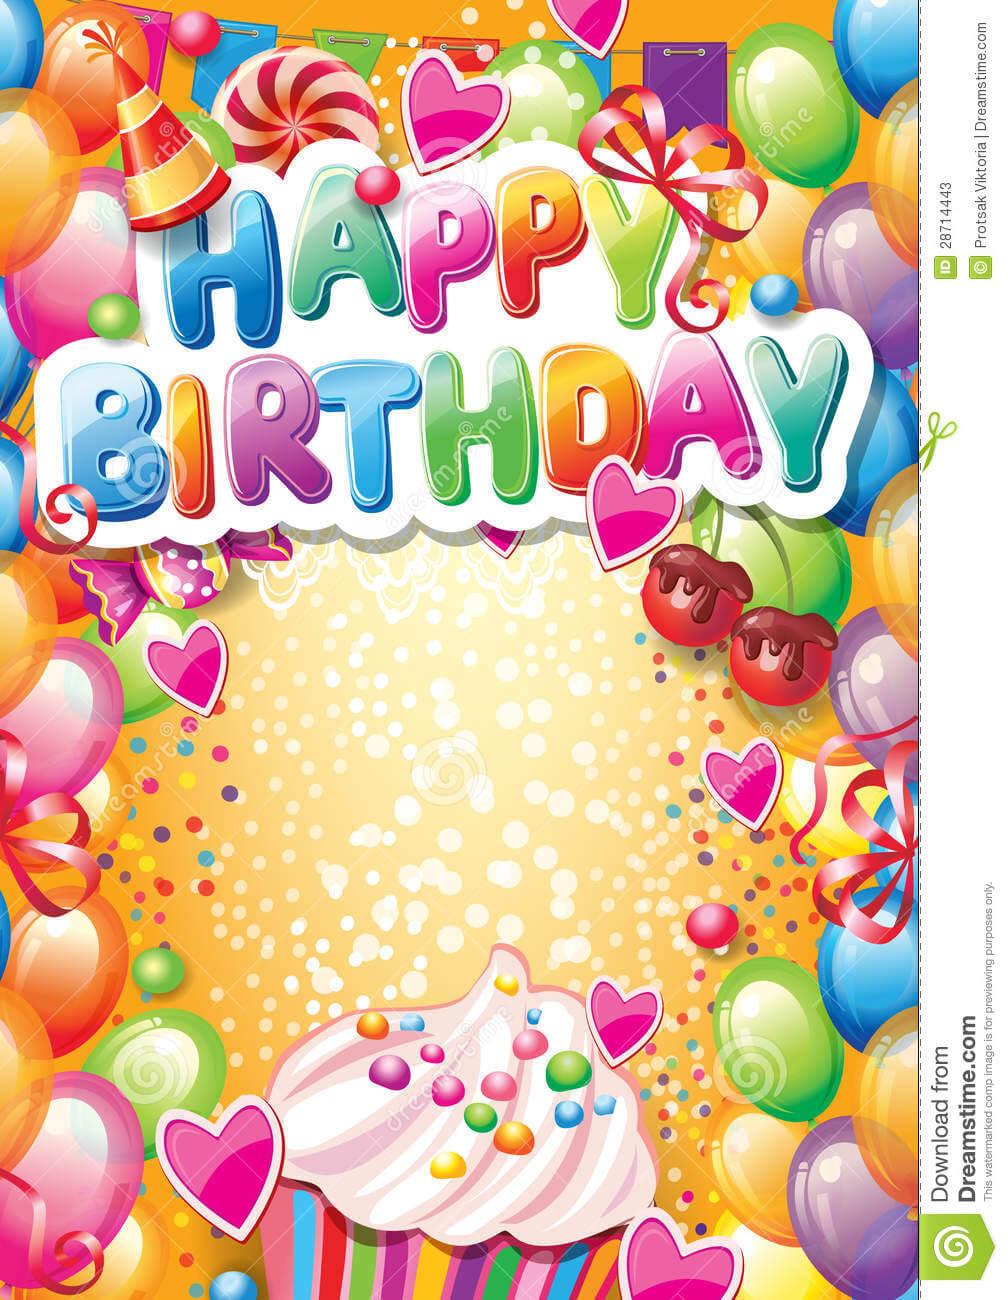 Microsoft Birthday Card Templates ] – Invitations 15Th Regarding Birthday Card Template Microsoft Word